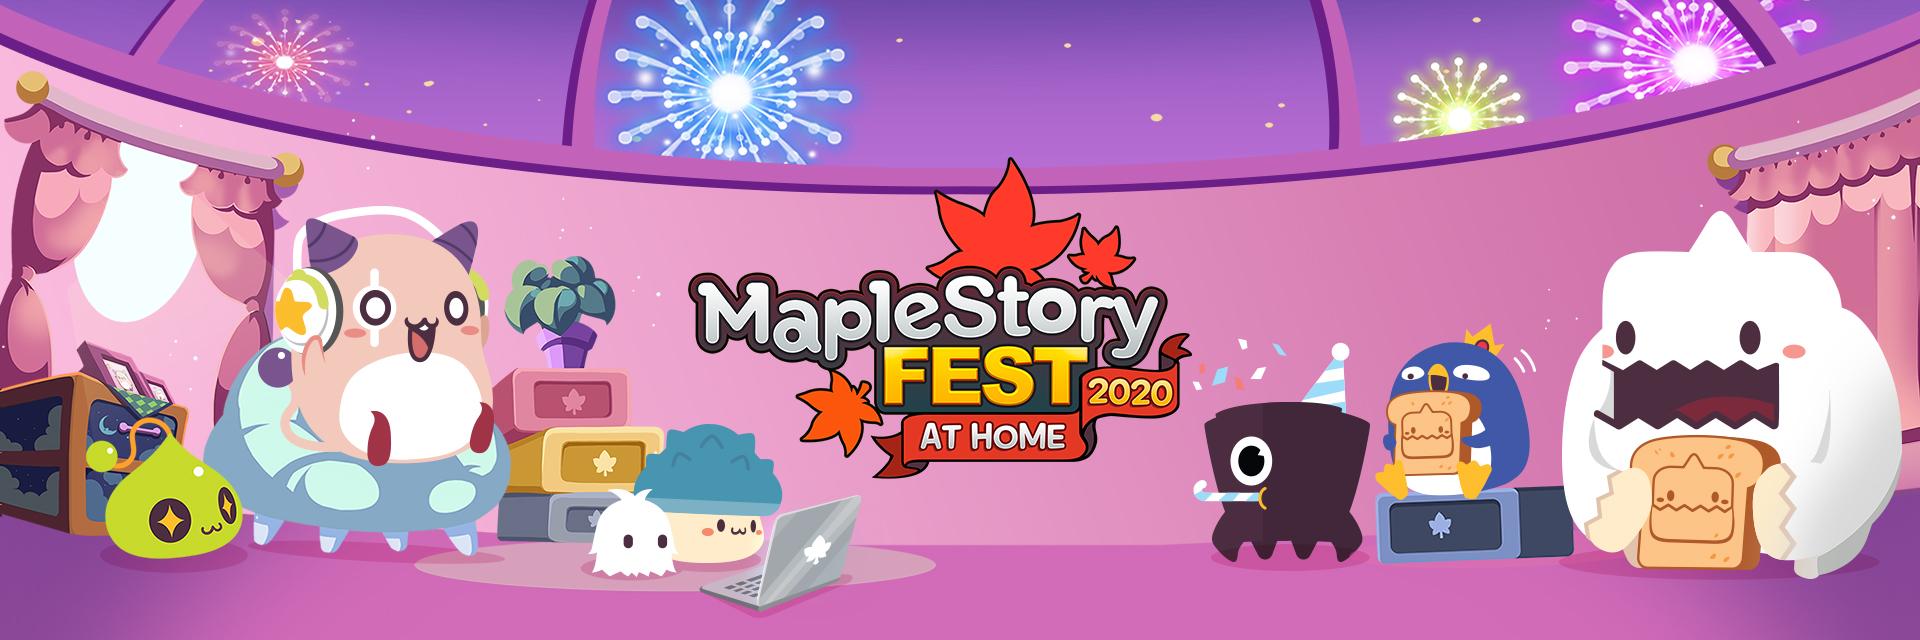 MapleStory Fest 2020 At Home Banner